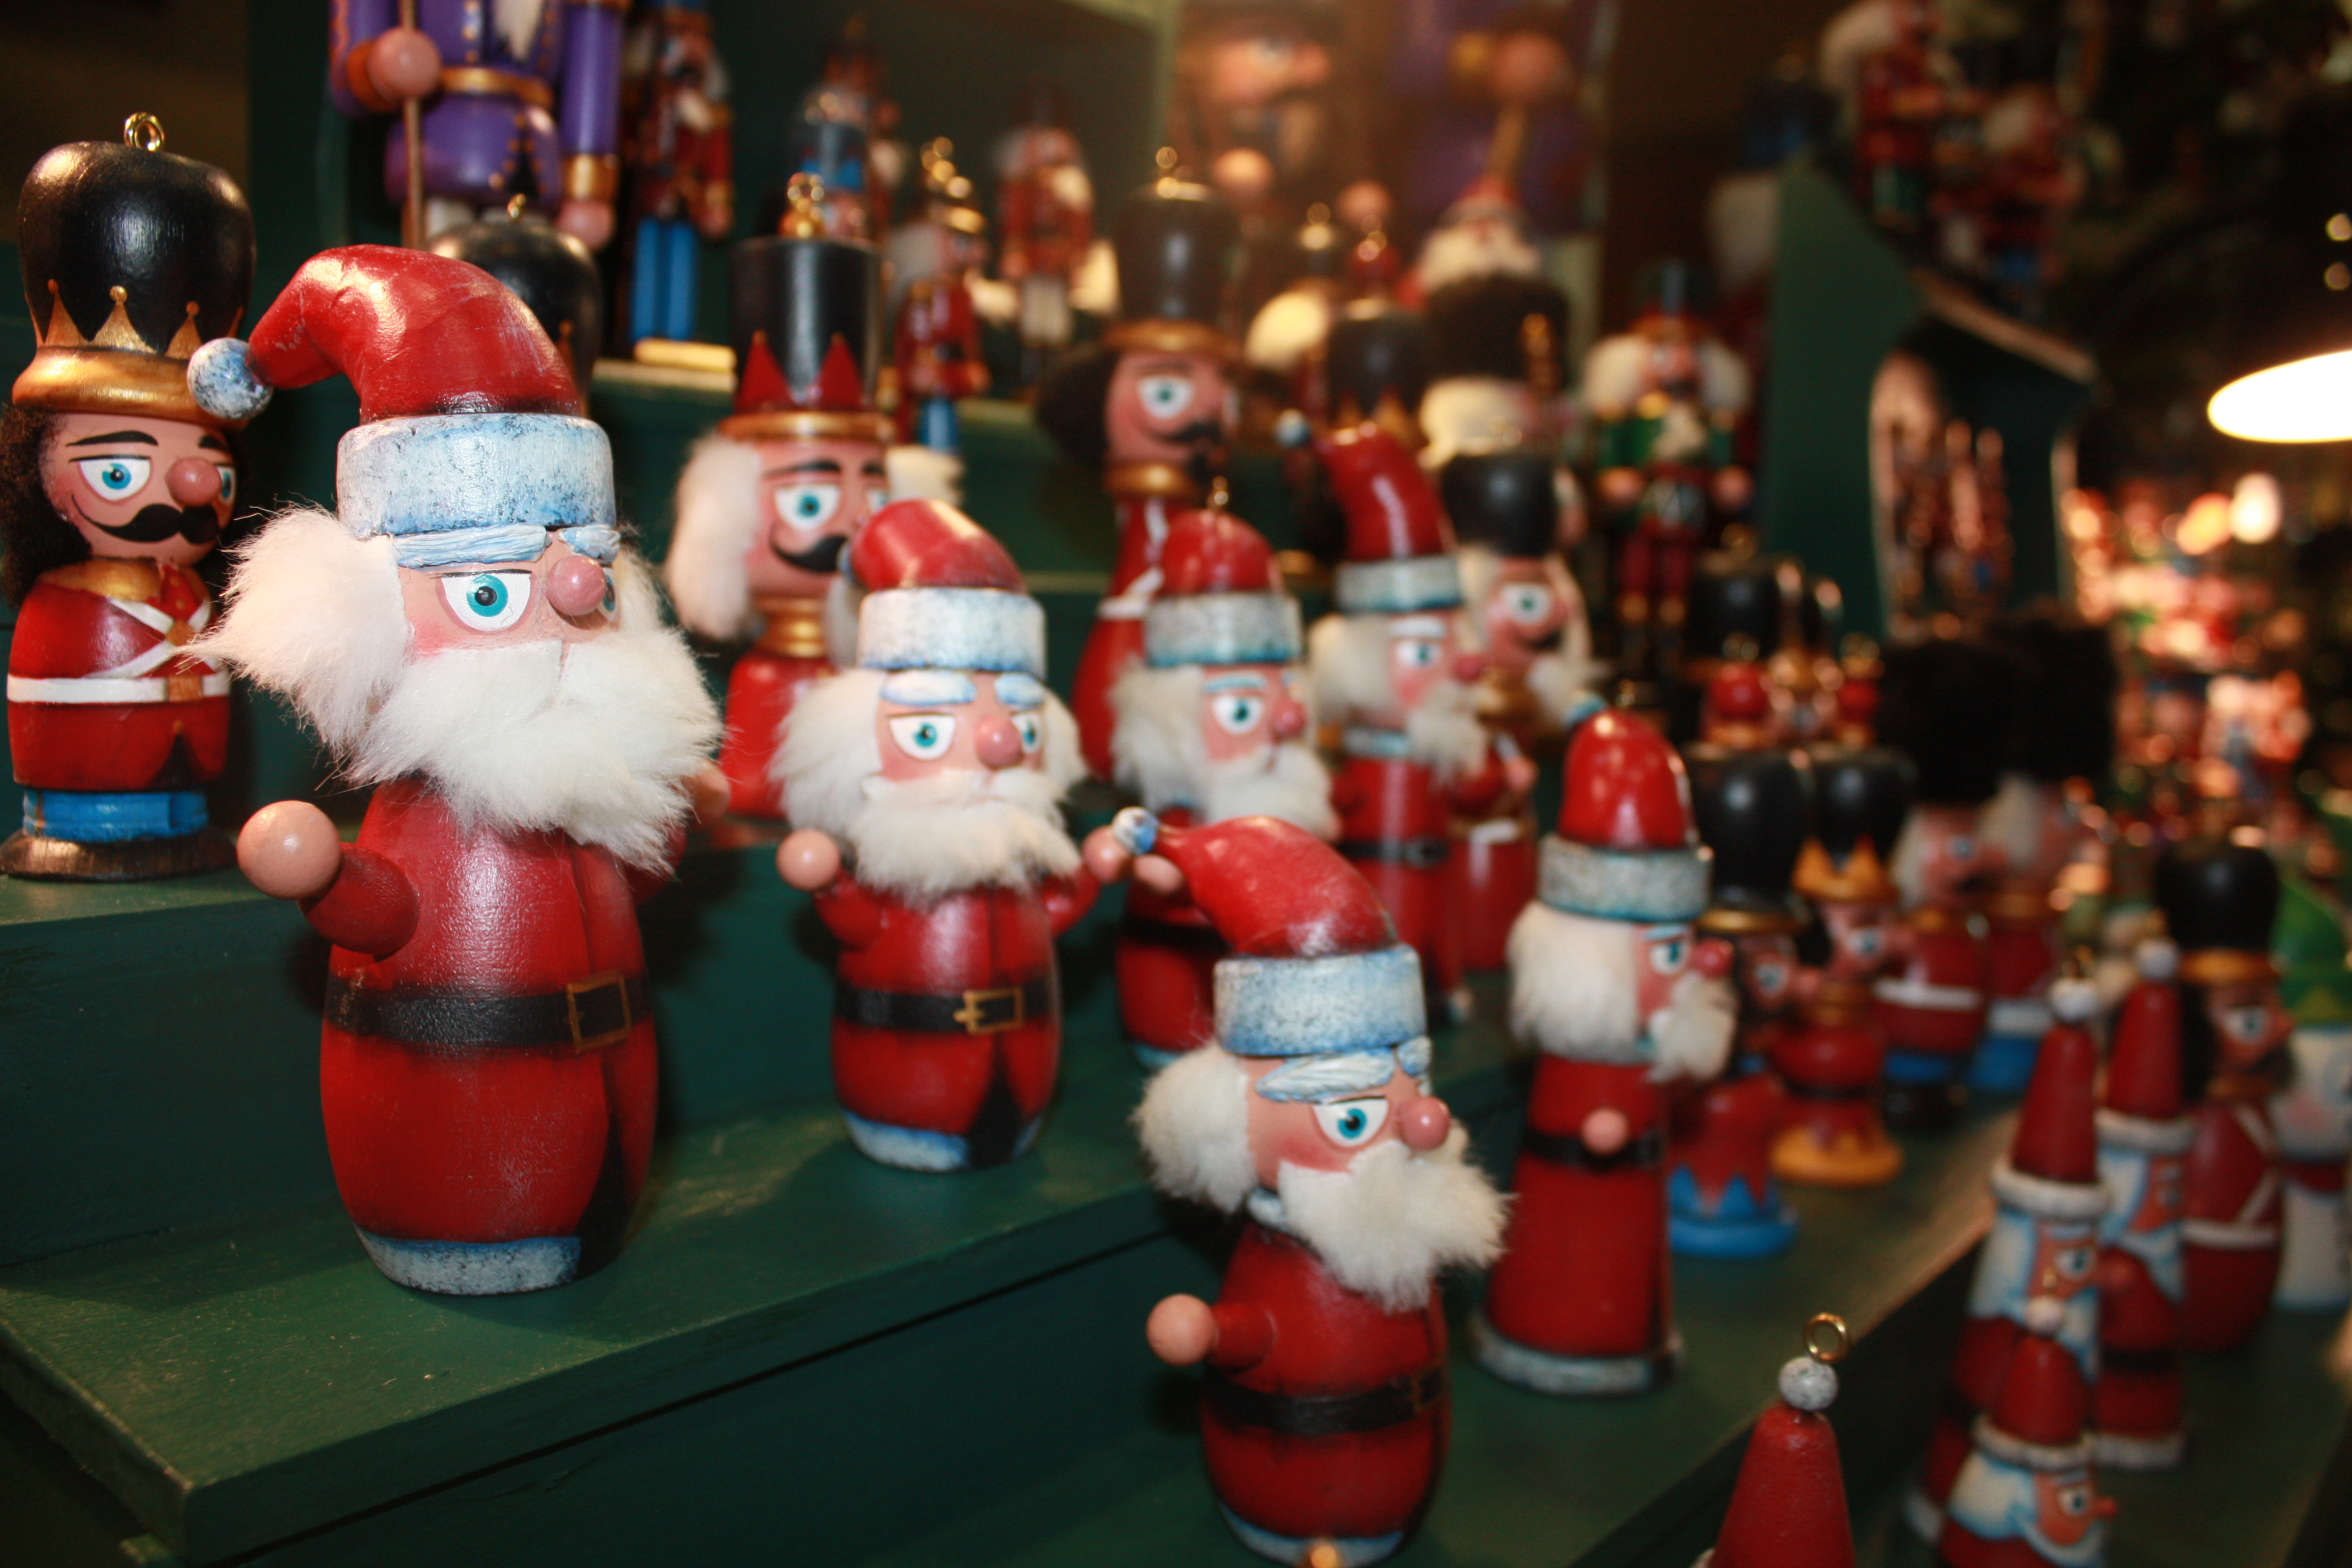 Christkindlesmarkt/Holiday Crafts Bazaar